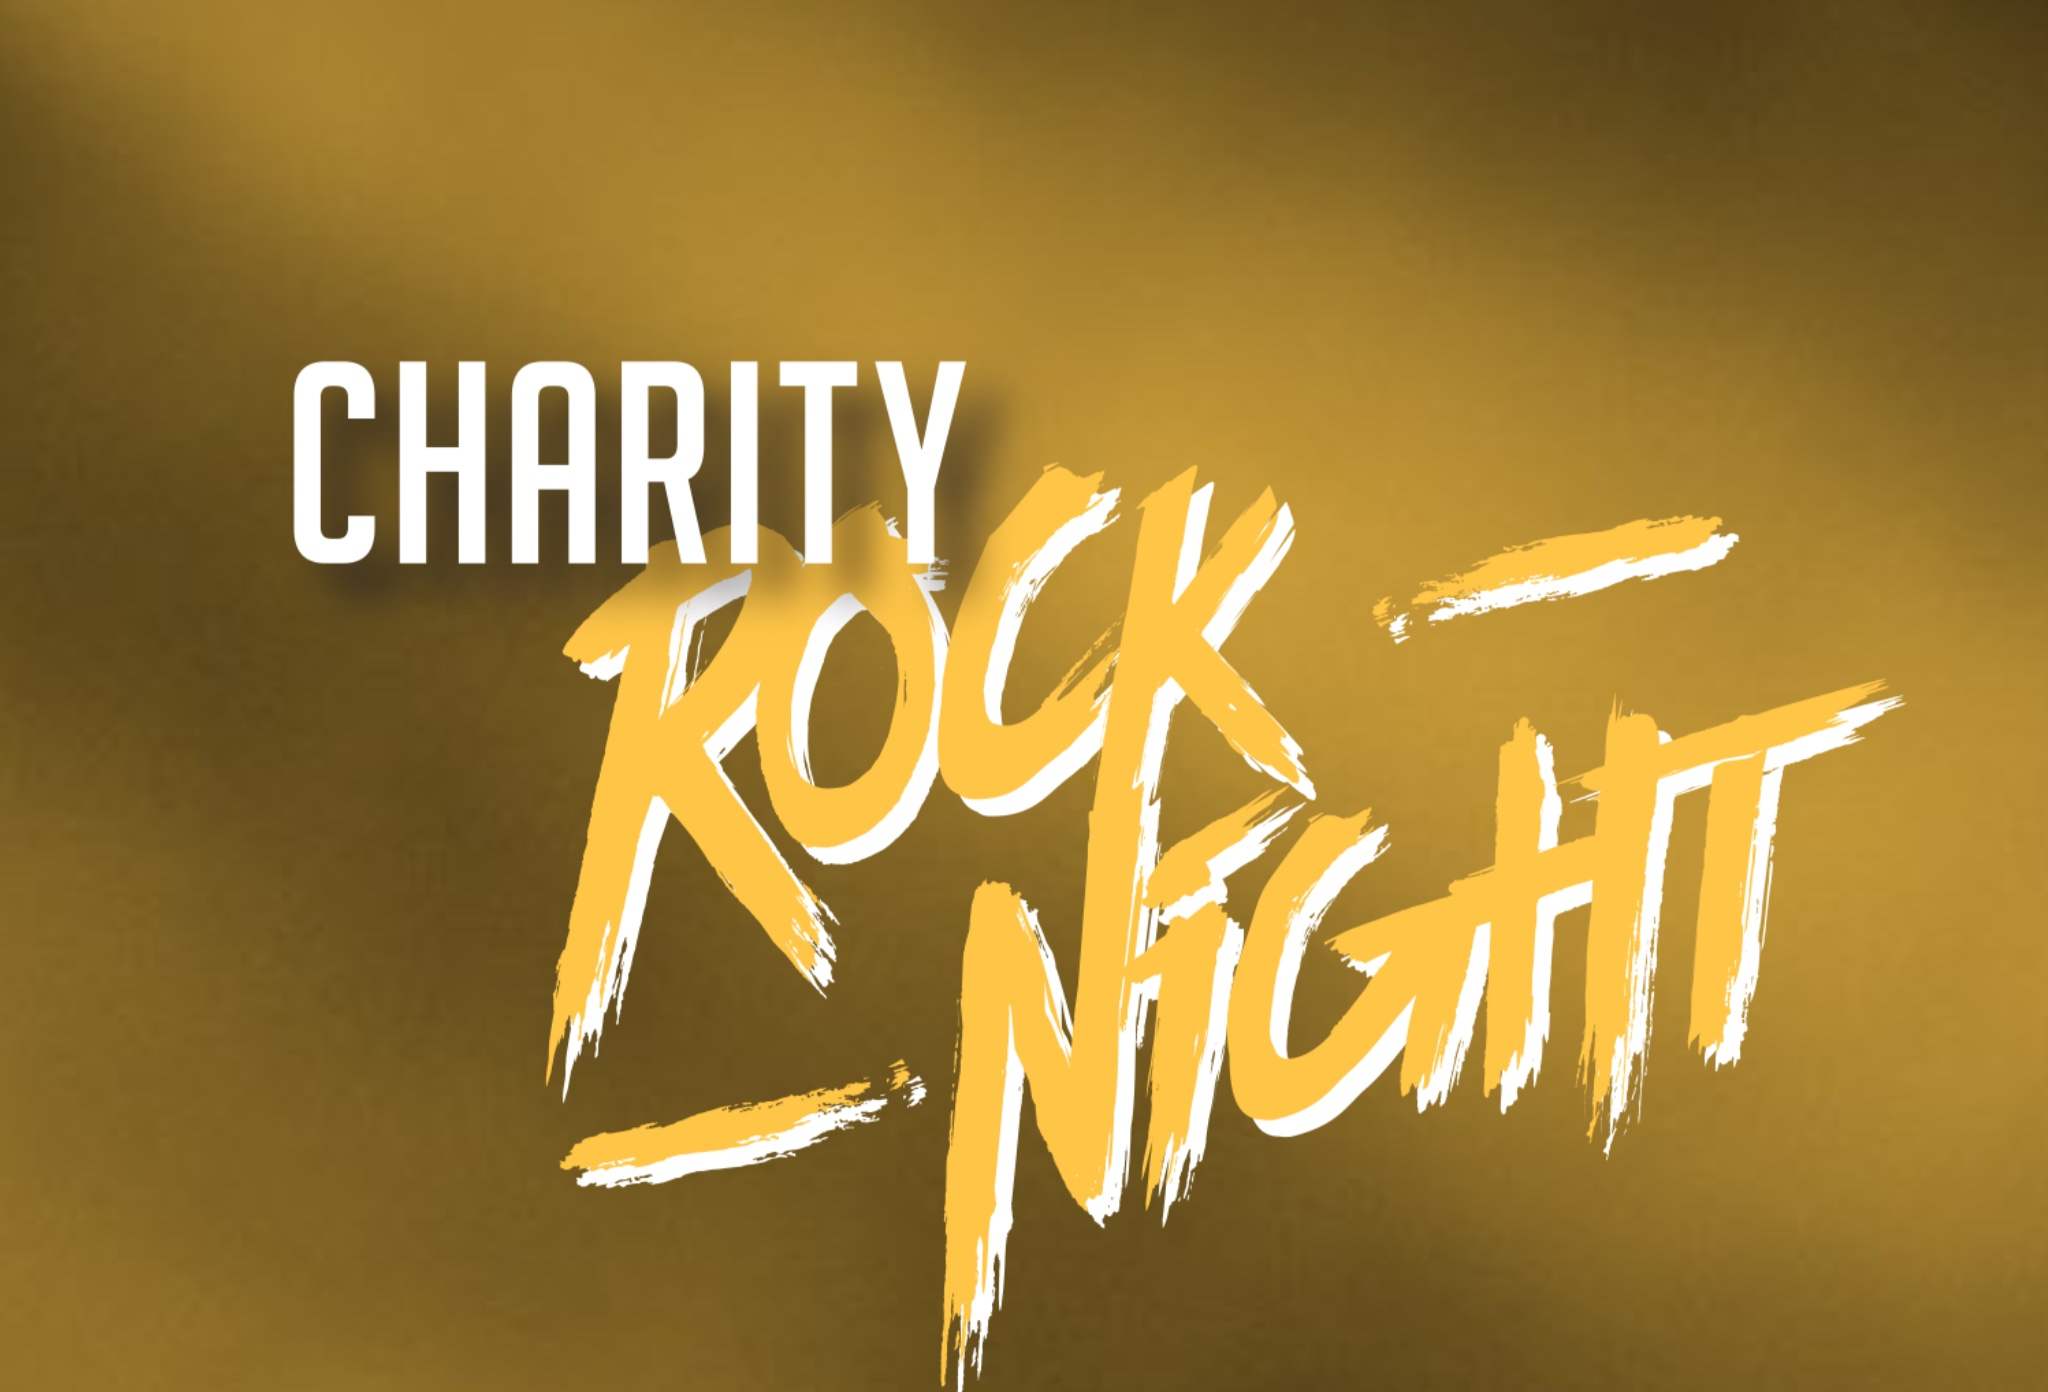 Komm zur Charity Rock Night